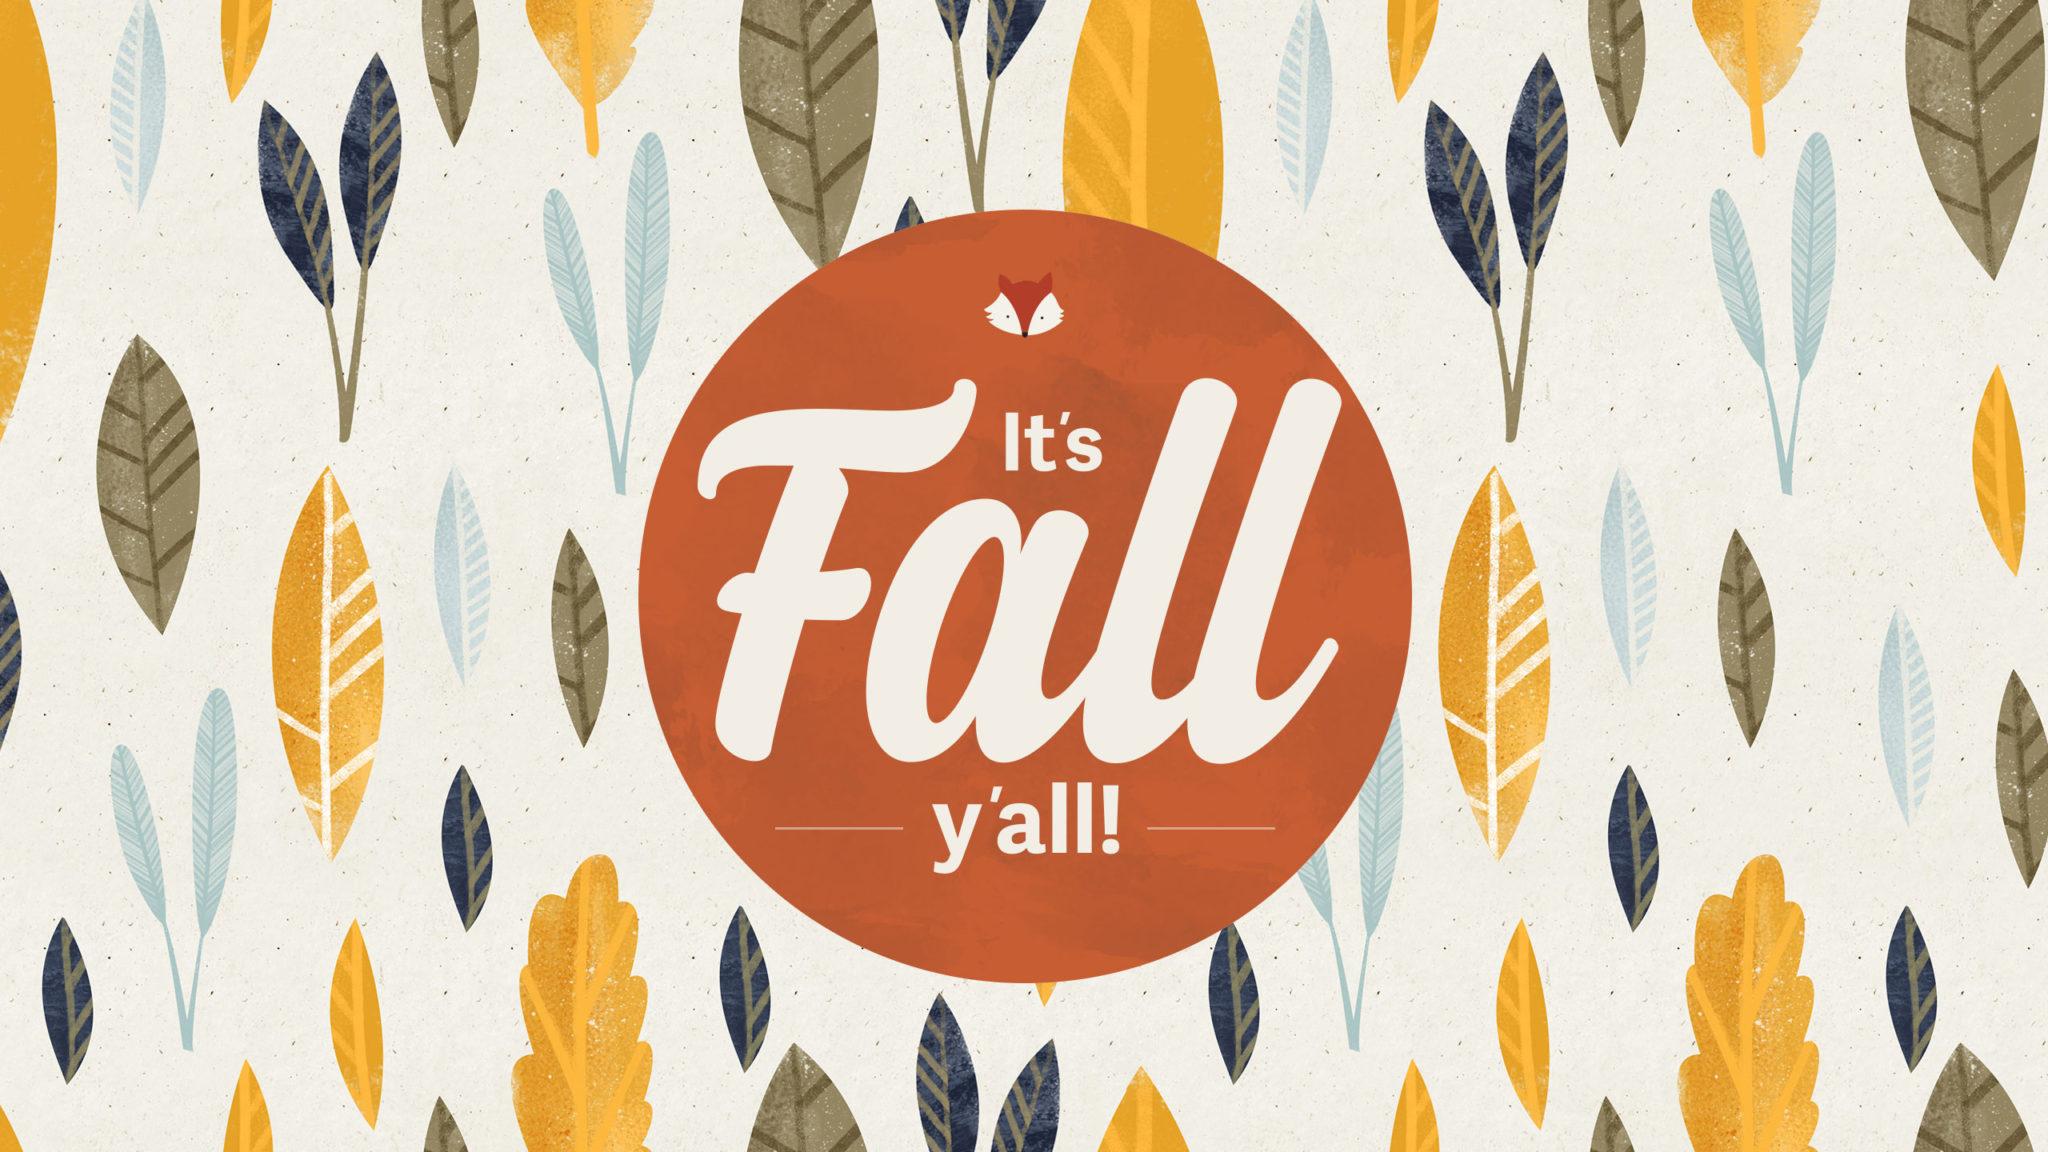 How To Fix Falling Wallpaper Free Desktop Wallpaper Fall 2016 Powderkeg Web Design